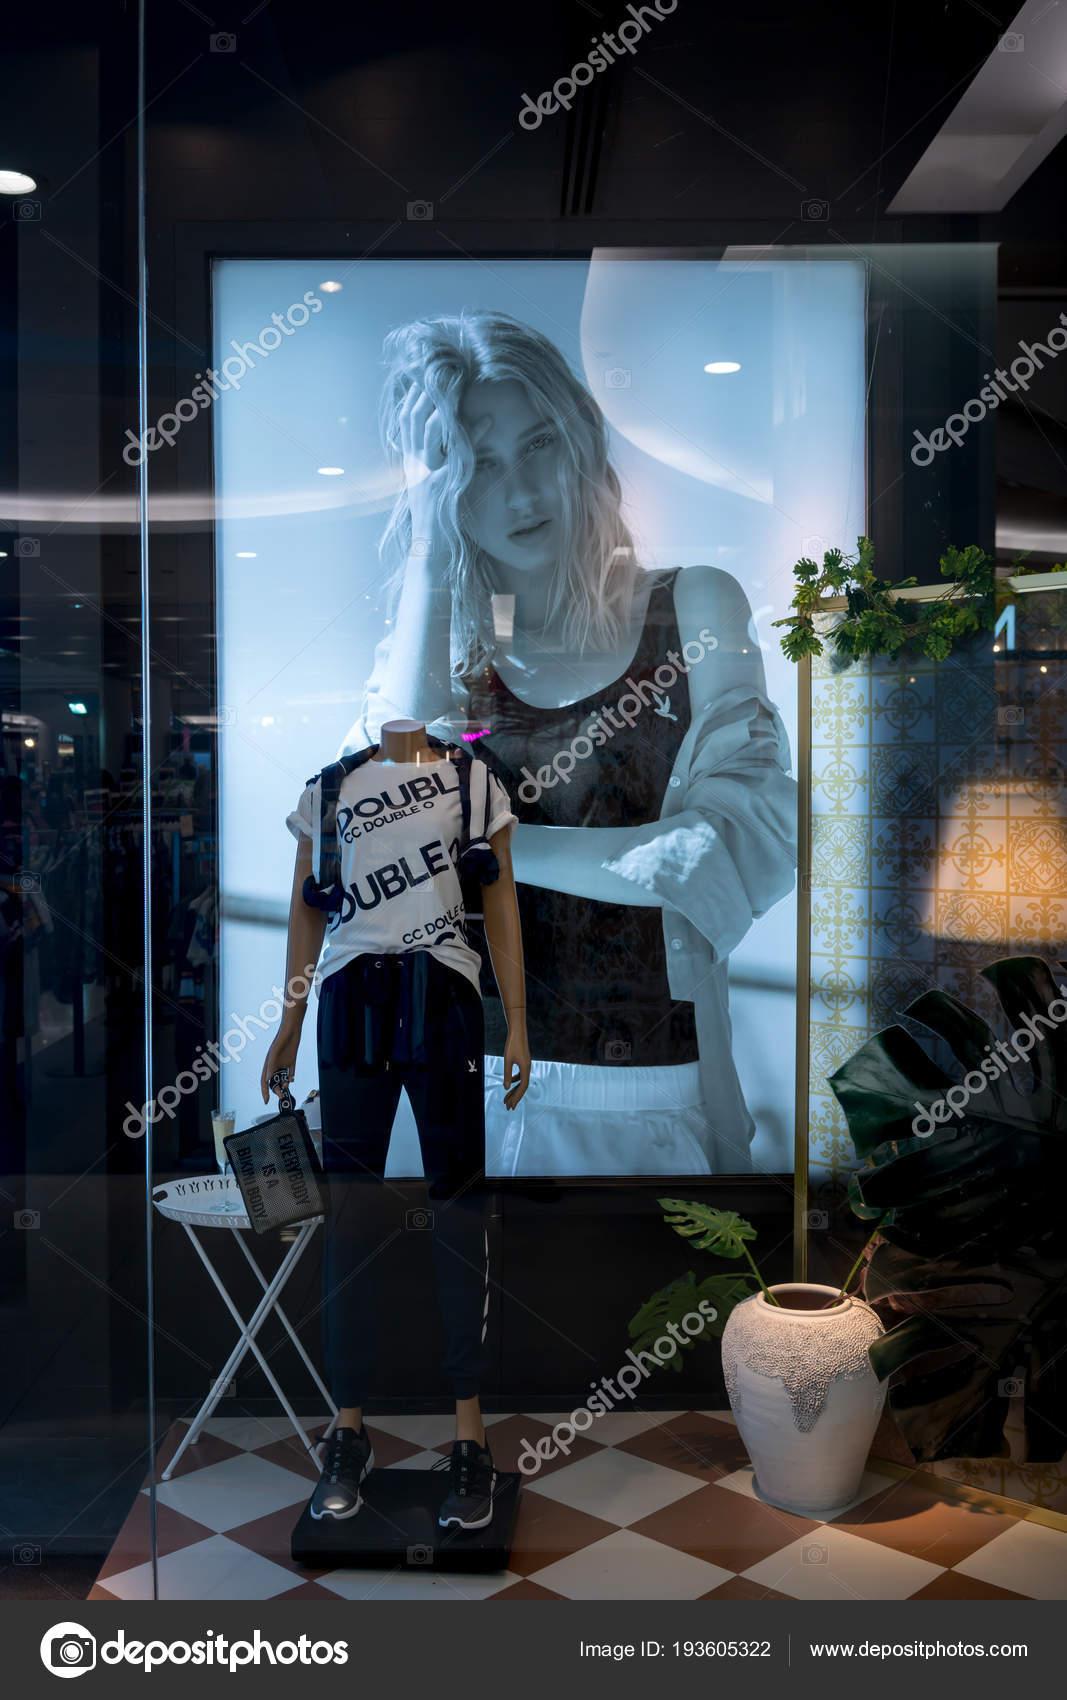 e9def85d69a CC-OO ccdoubleo shop at Fashion Island